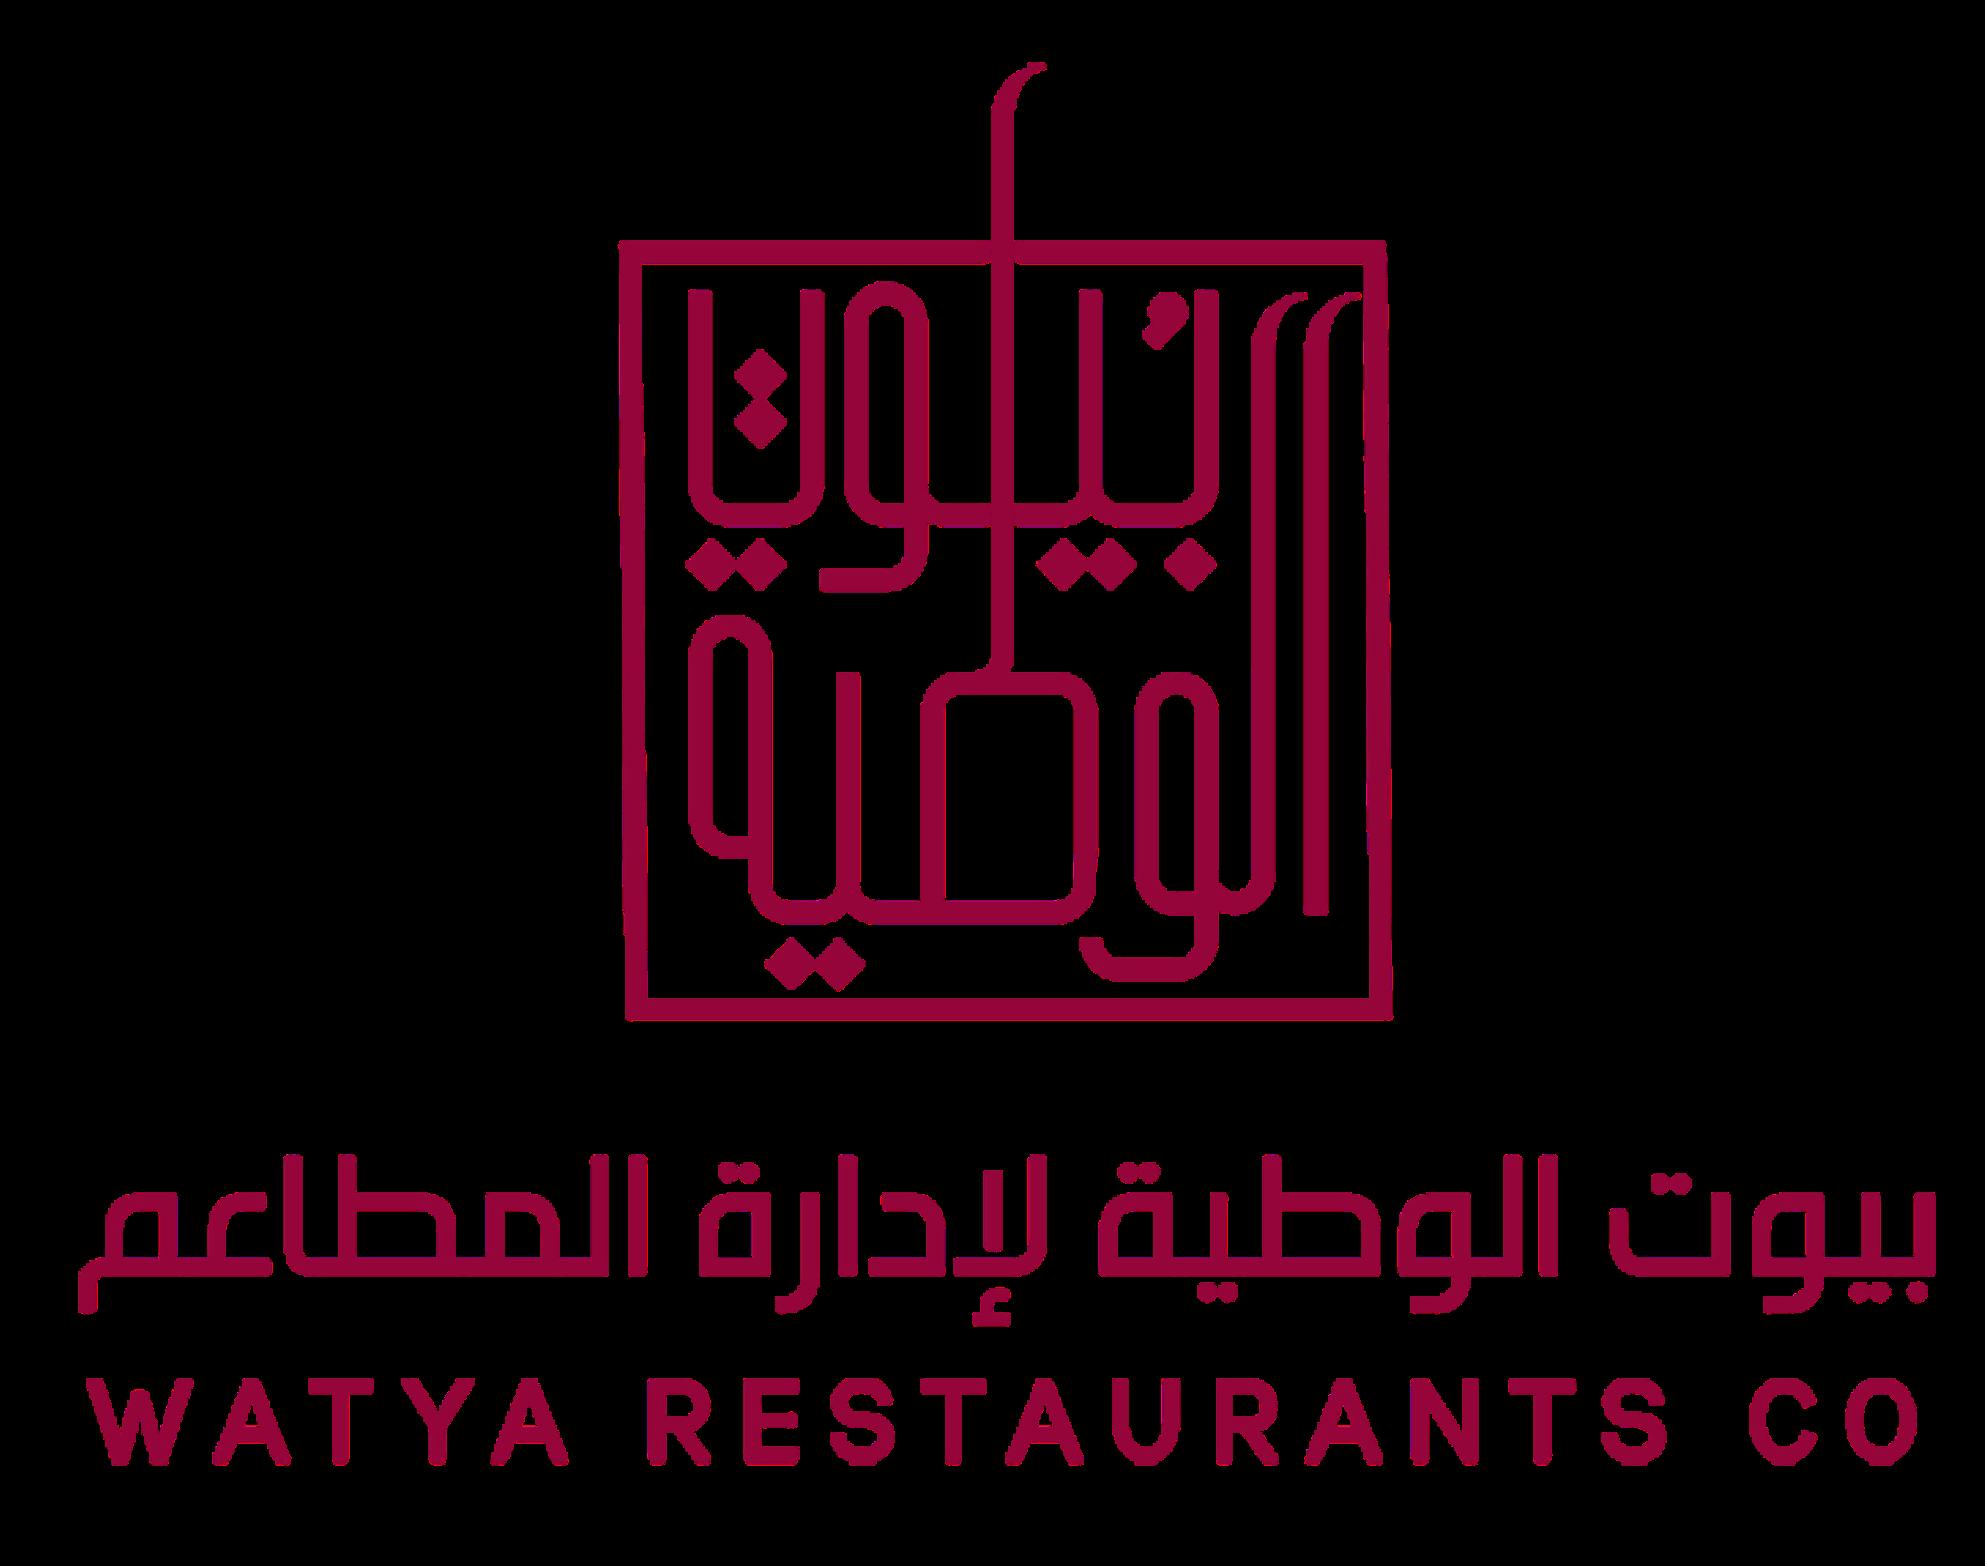 Watya Restaurants